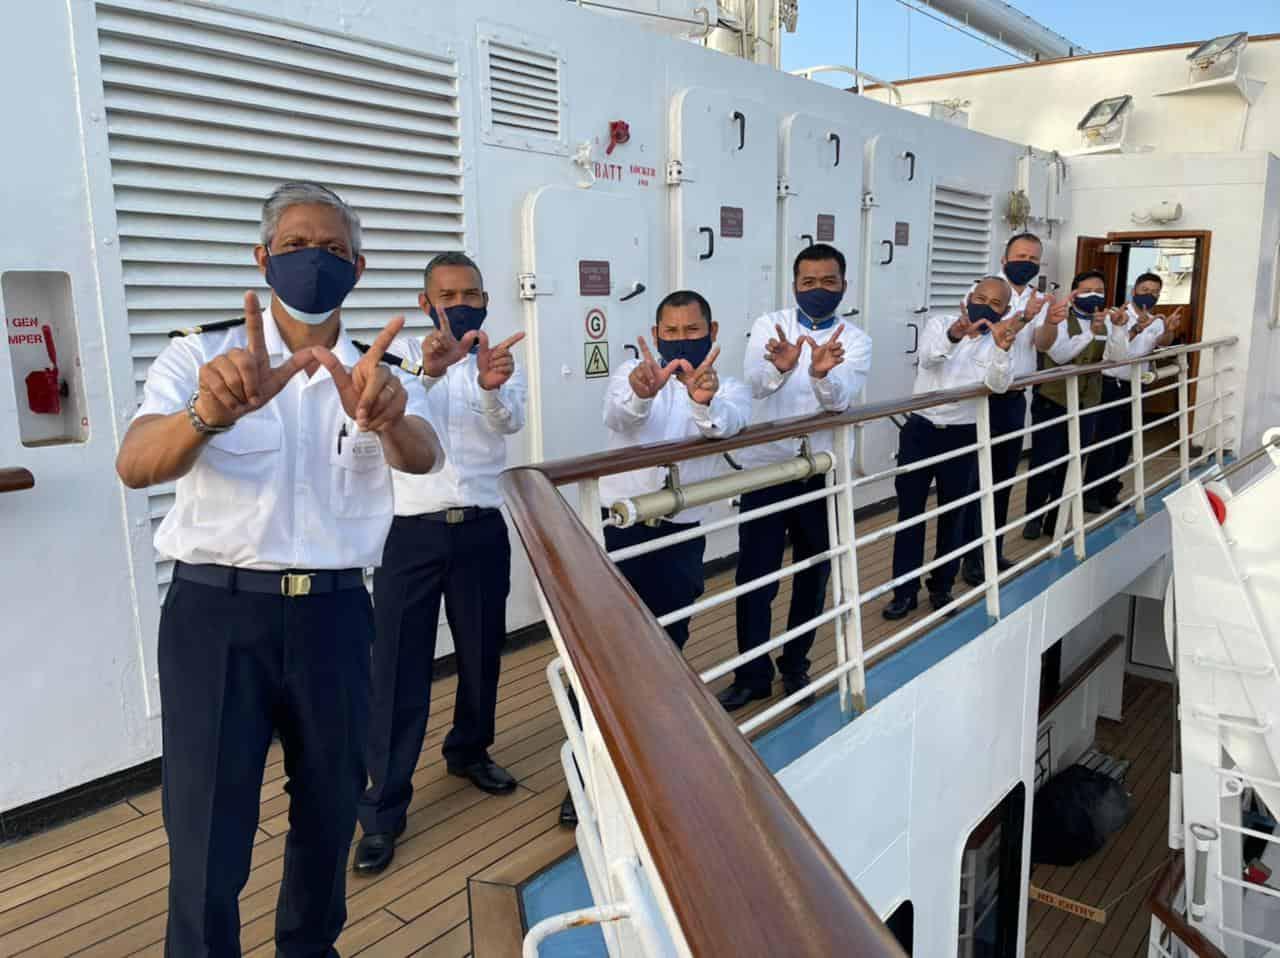 windstar cruises crew members